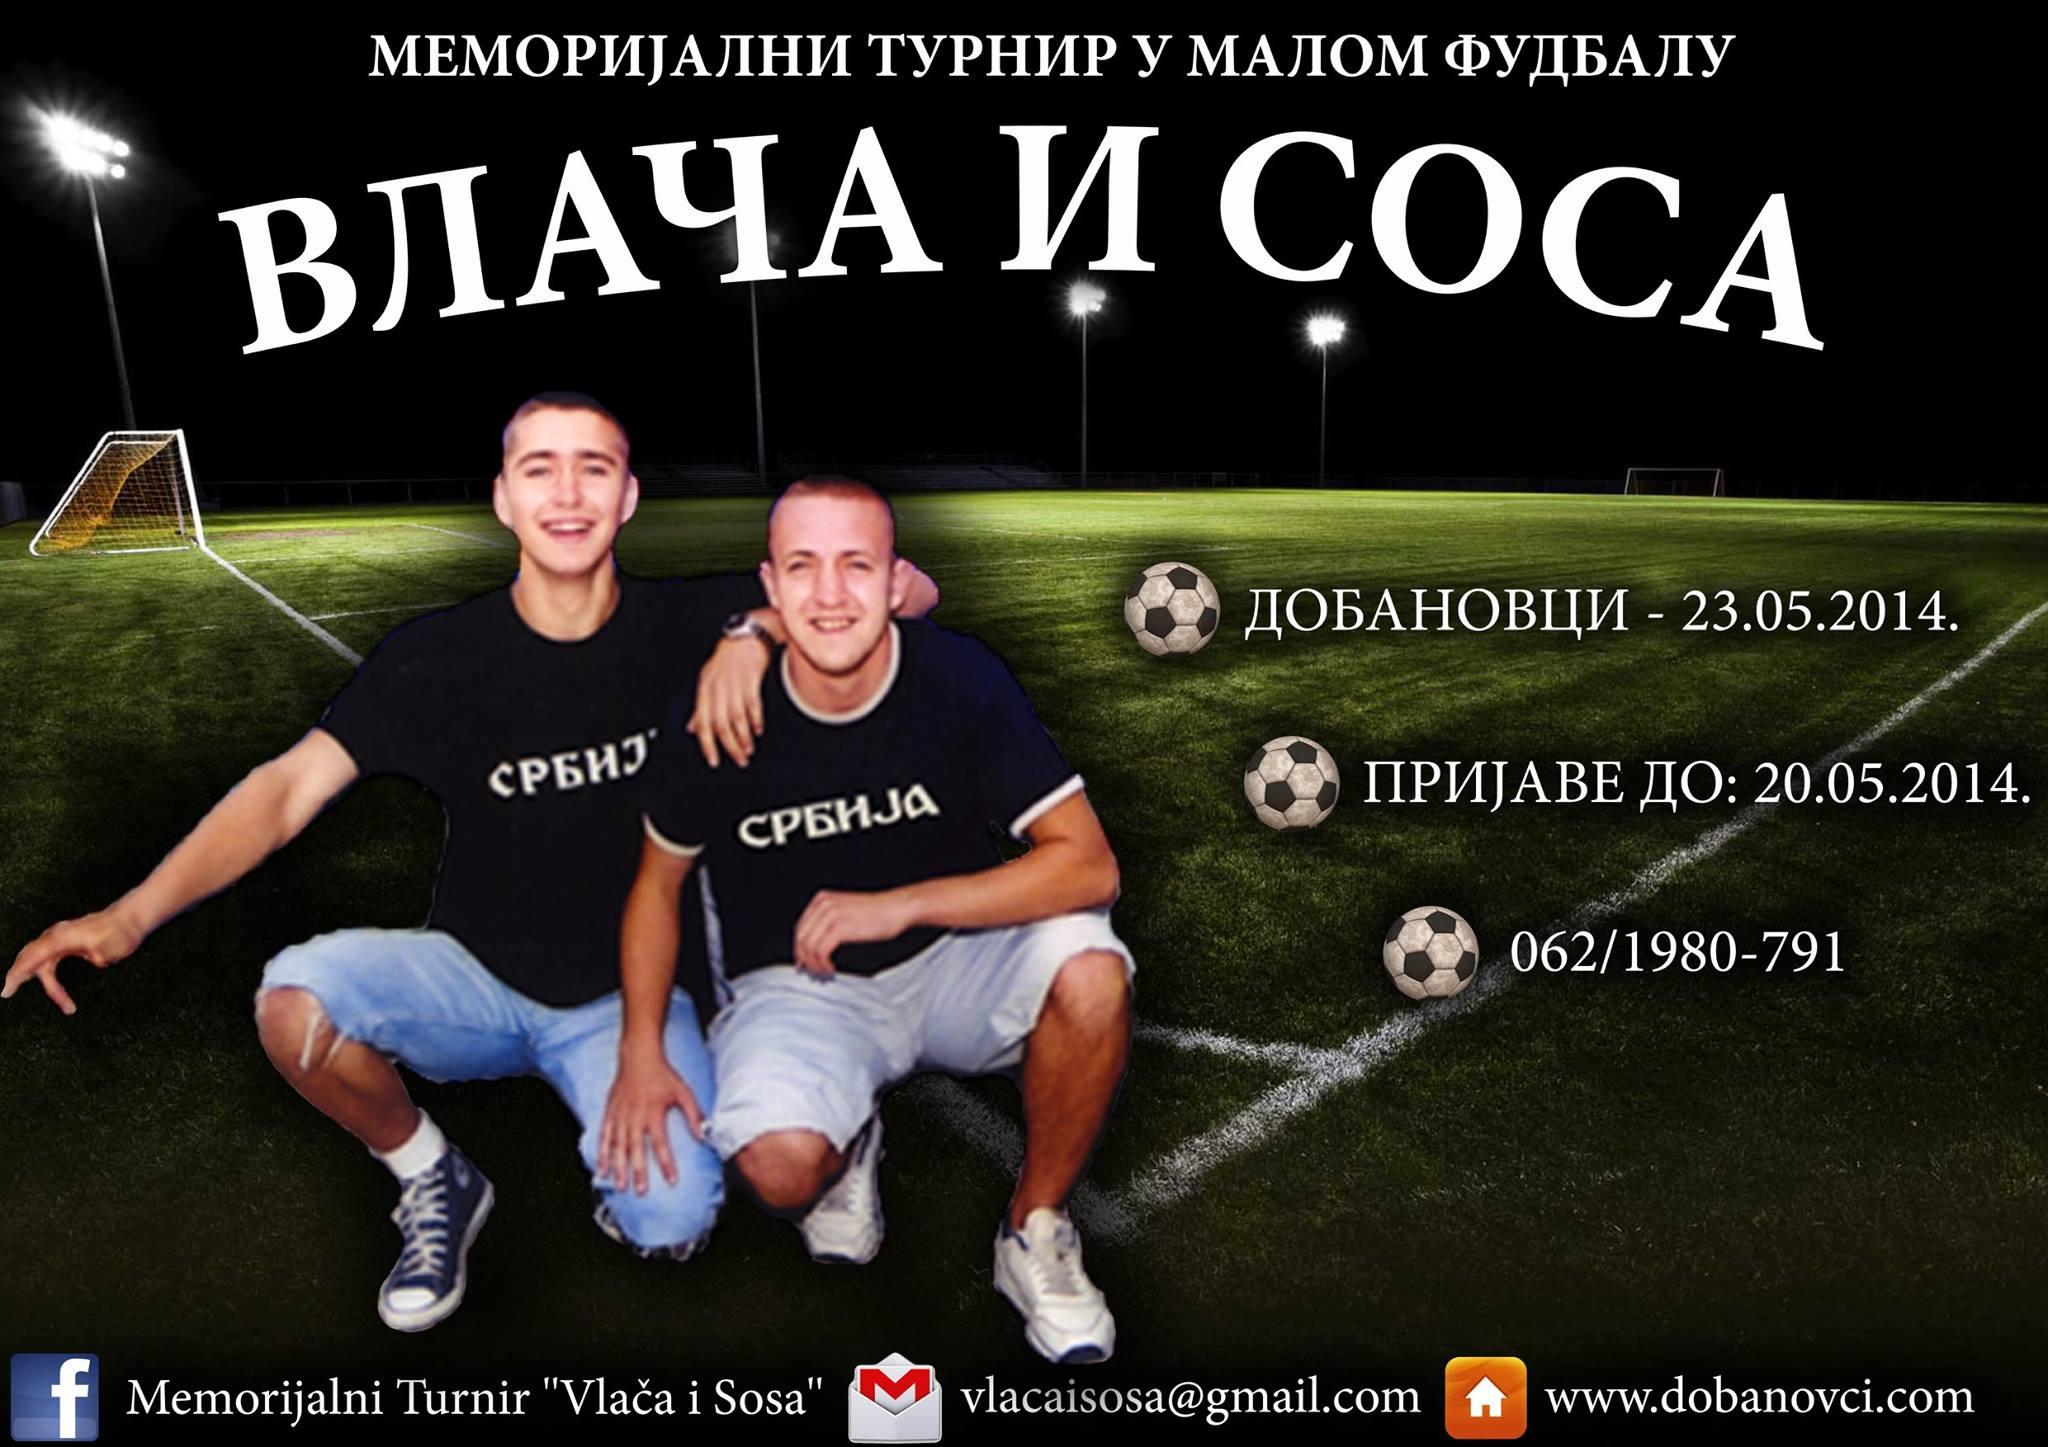 Vlača i Sosa – Memorijalni turnir 2014